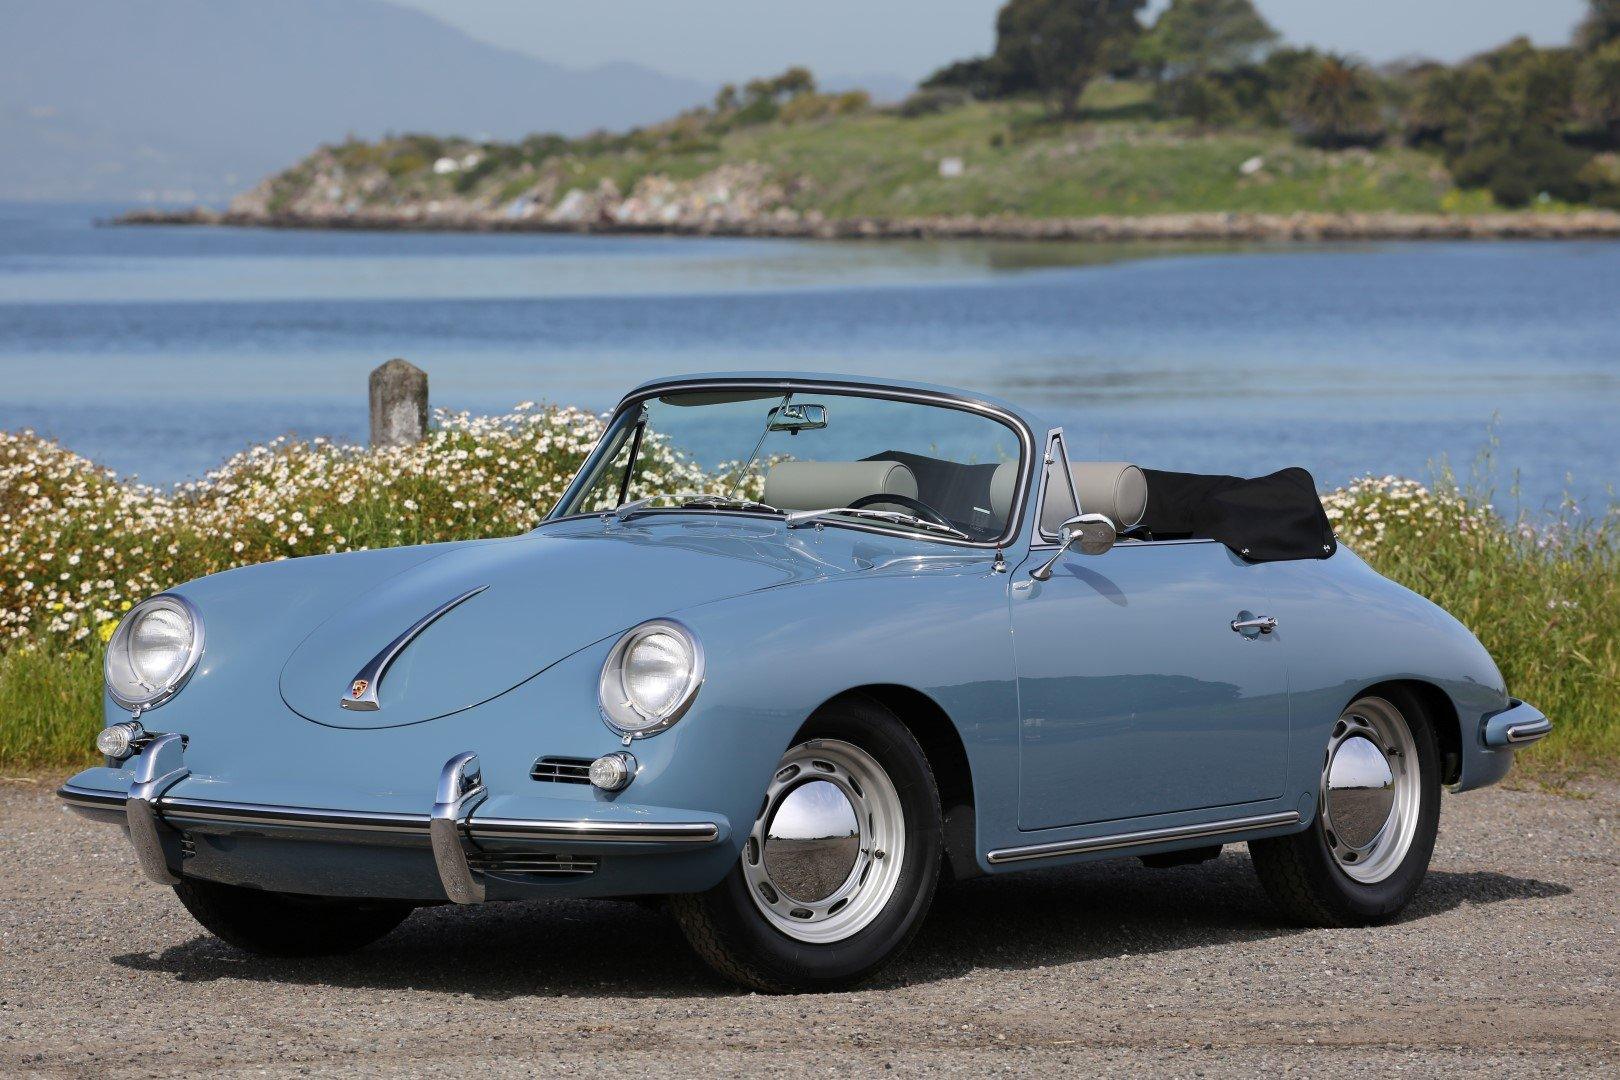 1960 Porsche 356 B Cabriolet Vintage Car For Sale